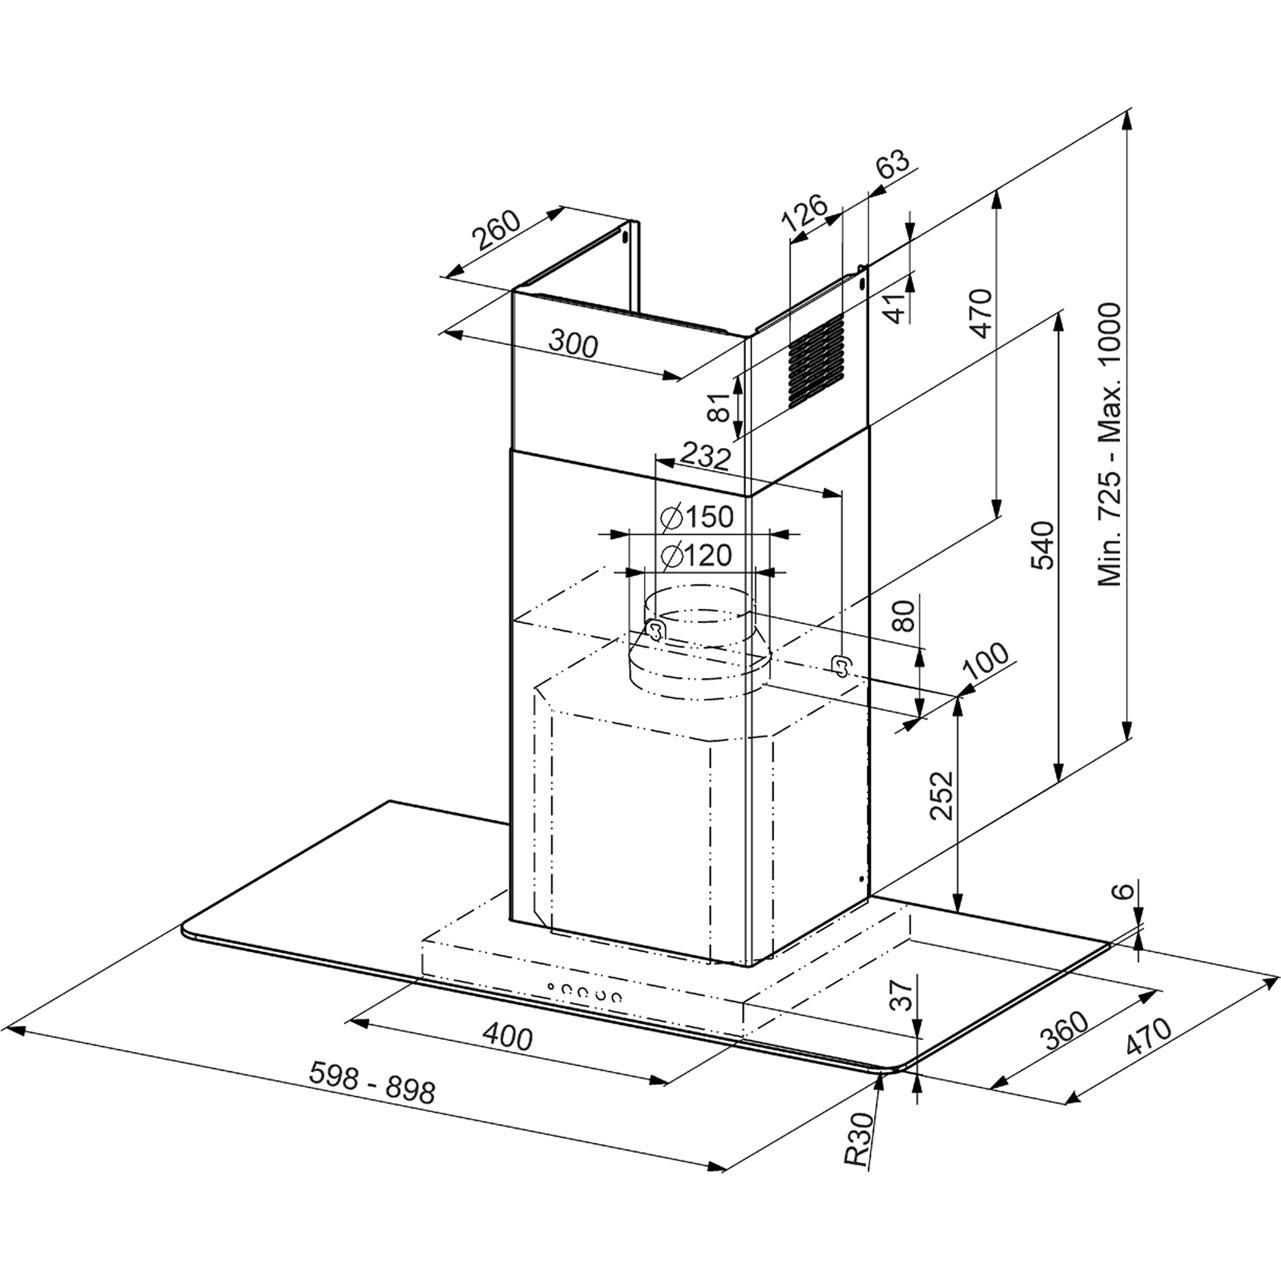 kfv92dne_ss_smeg_cookerhood_dim_l?resize=665%2C664&ssl=1 rangemaster cooker hood wiring diagram wiring diagram rangemaster cooker hood wiring diagram at n-0.co